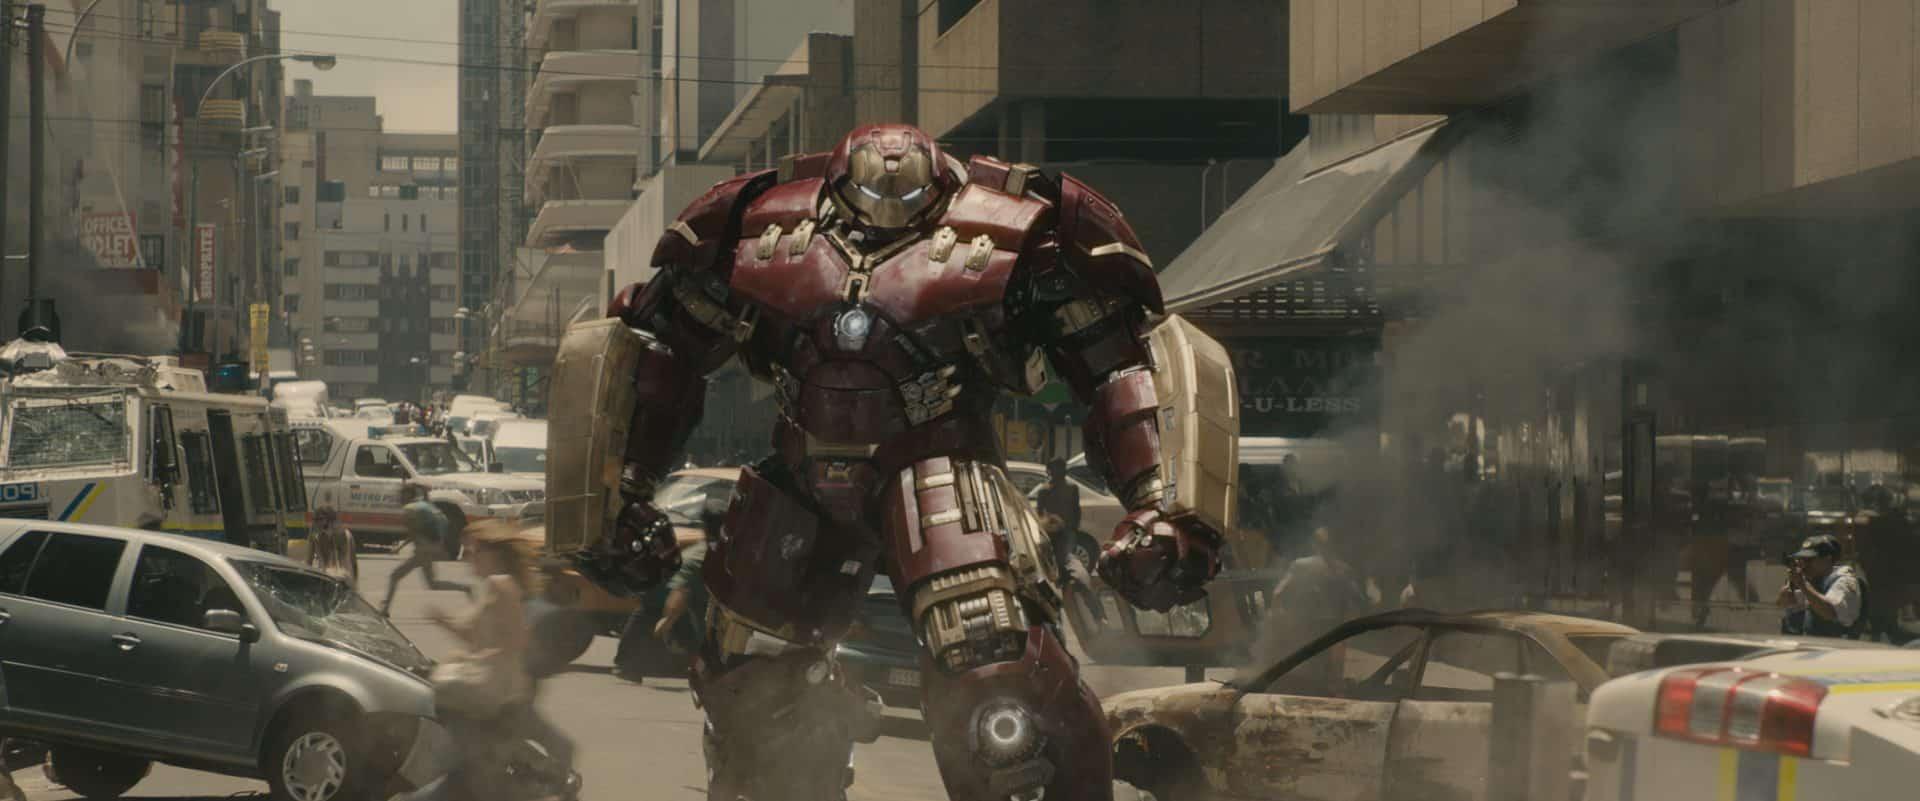 avengers age of ultron vek ultrona hulkbuster